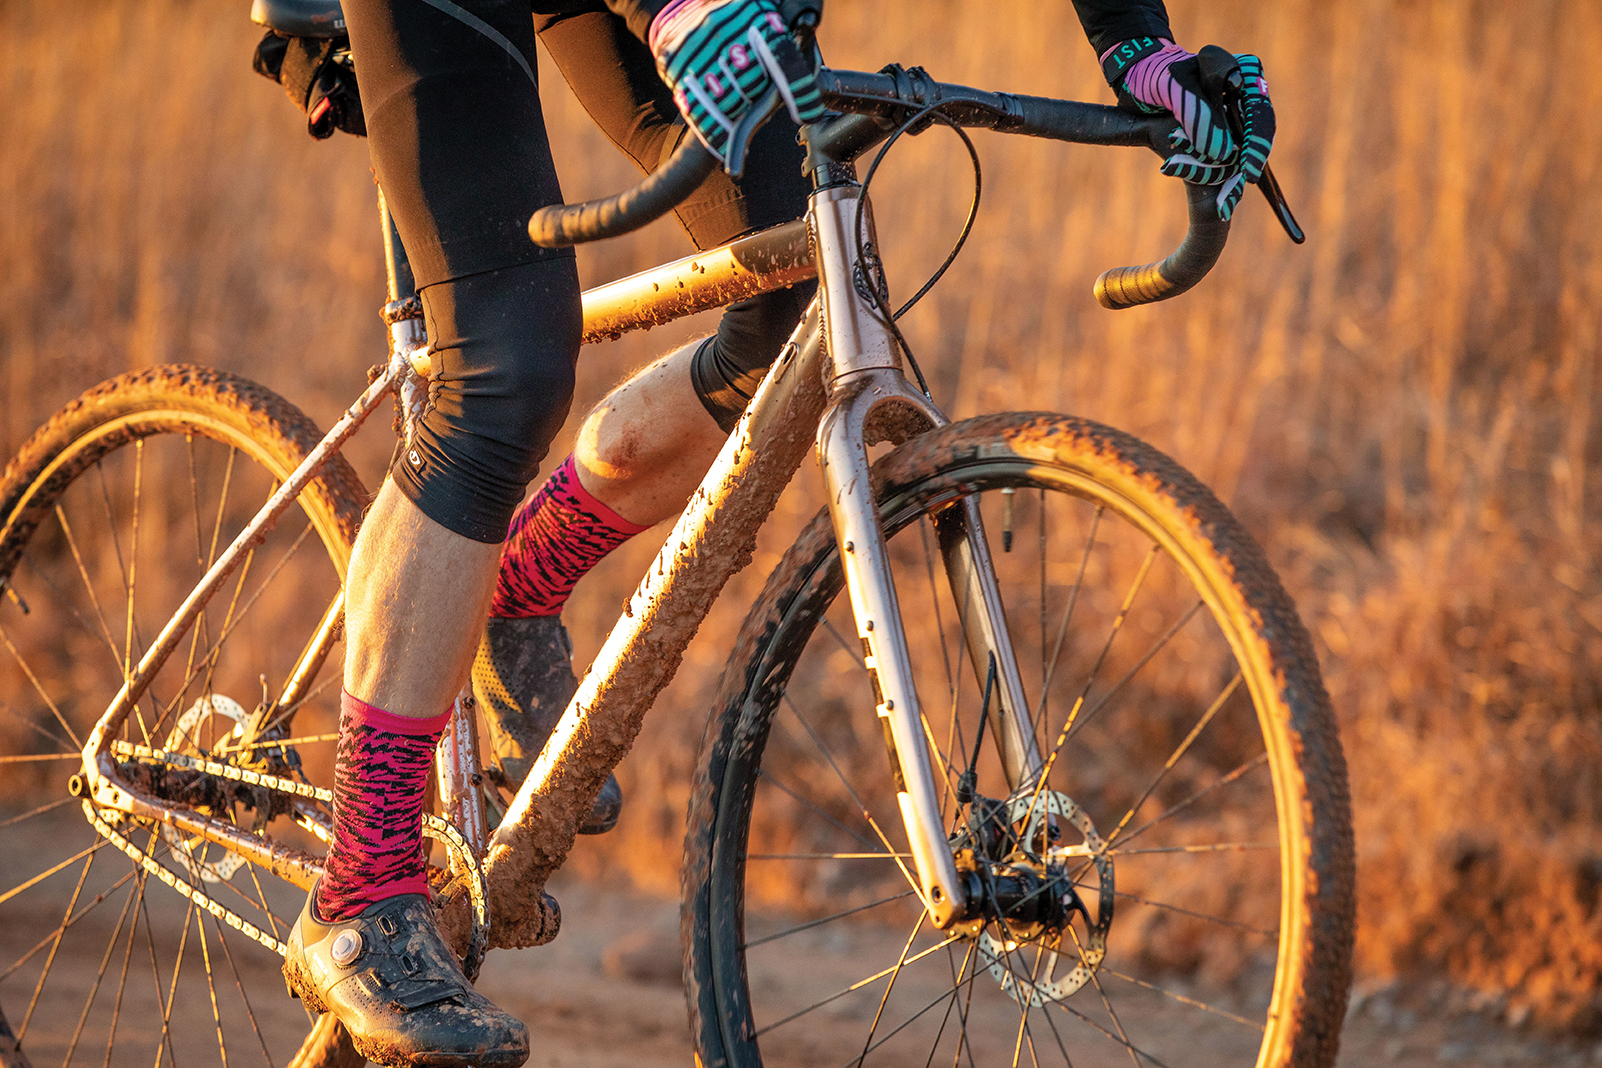 Salsa Cycles' Stormchaser bike